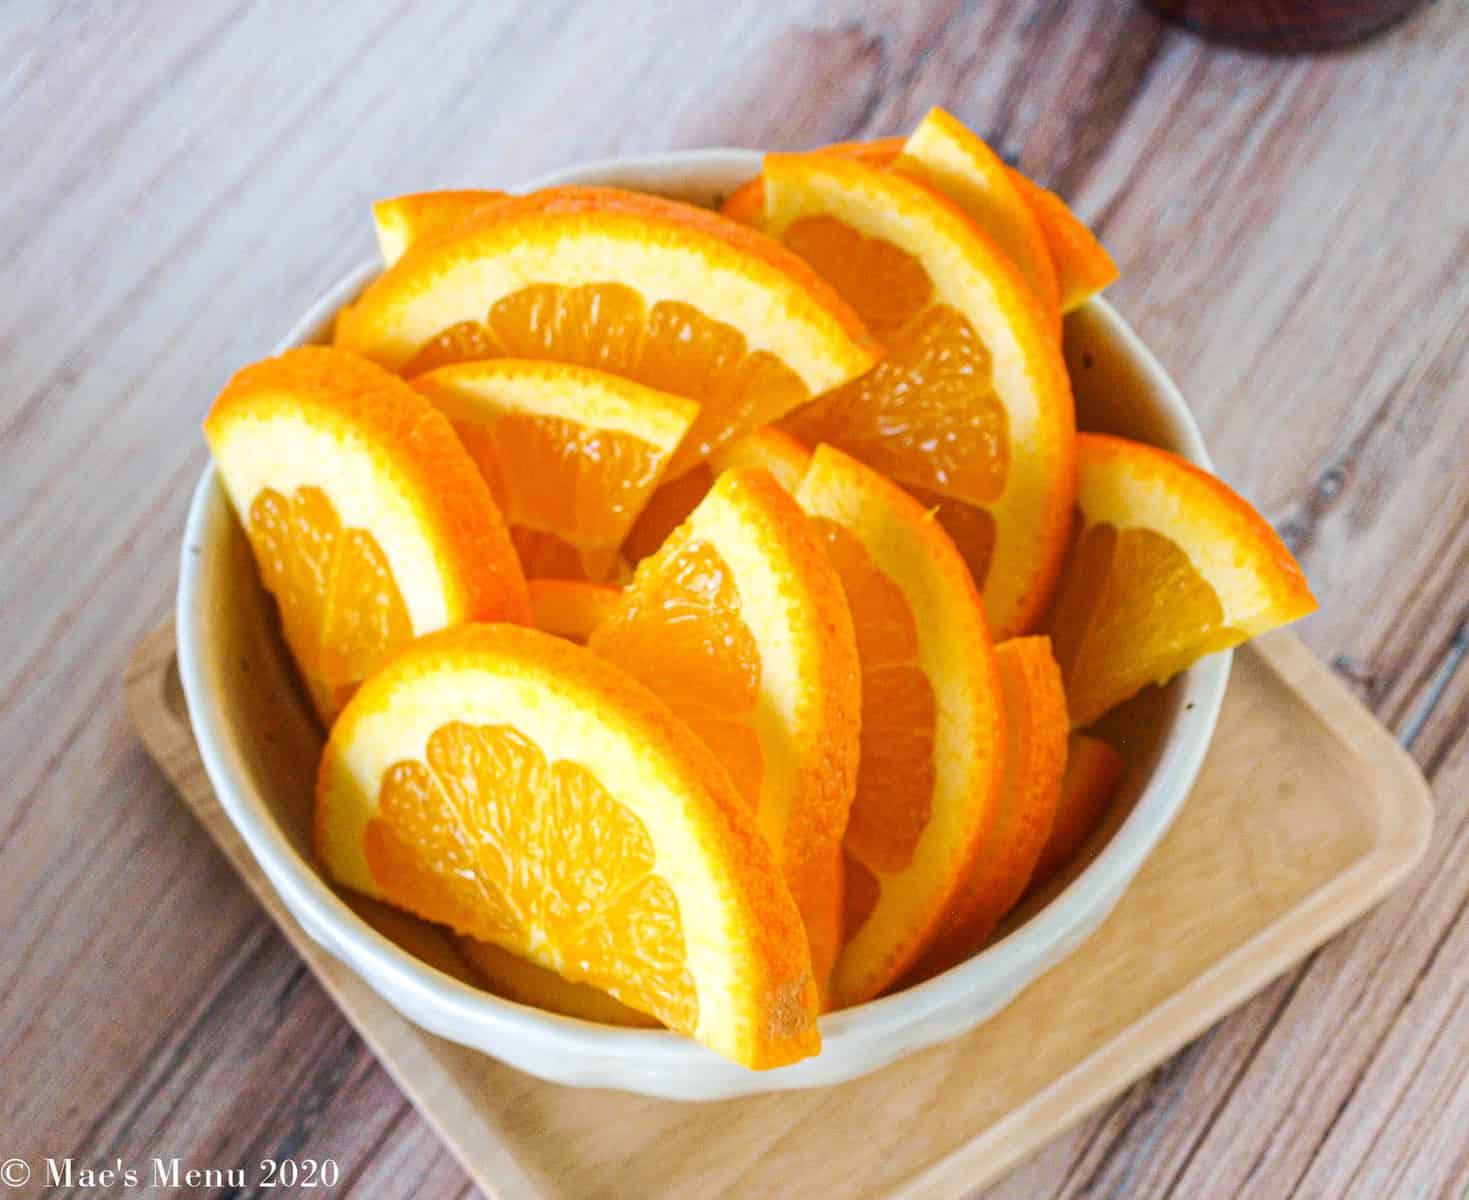 A small dish of orange slices